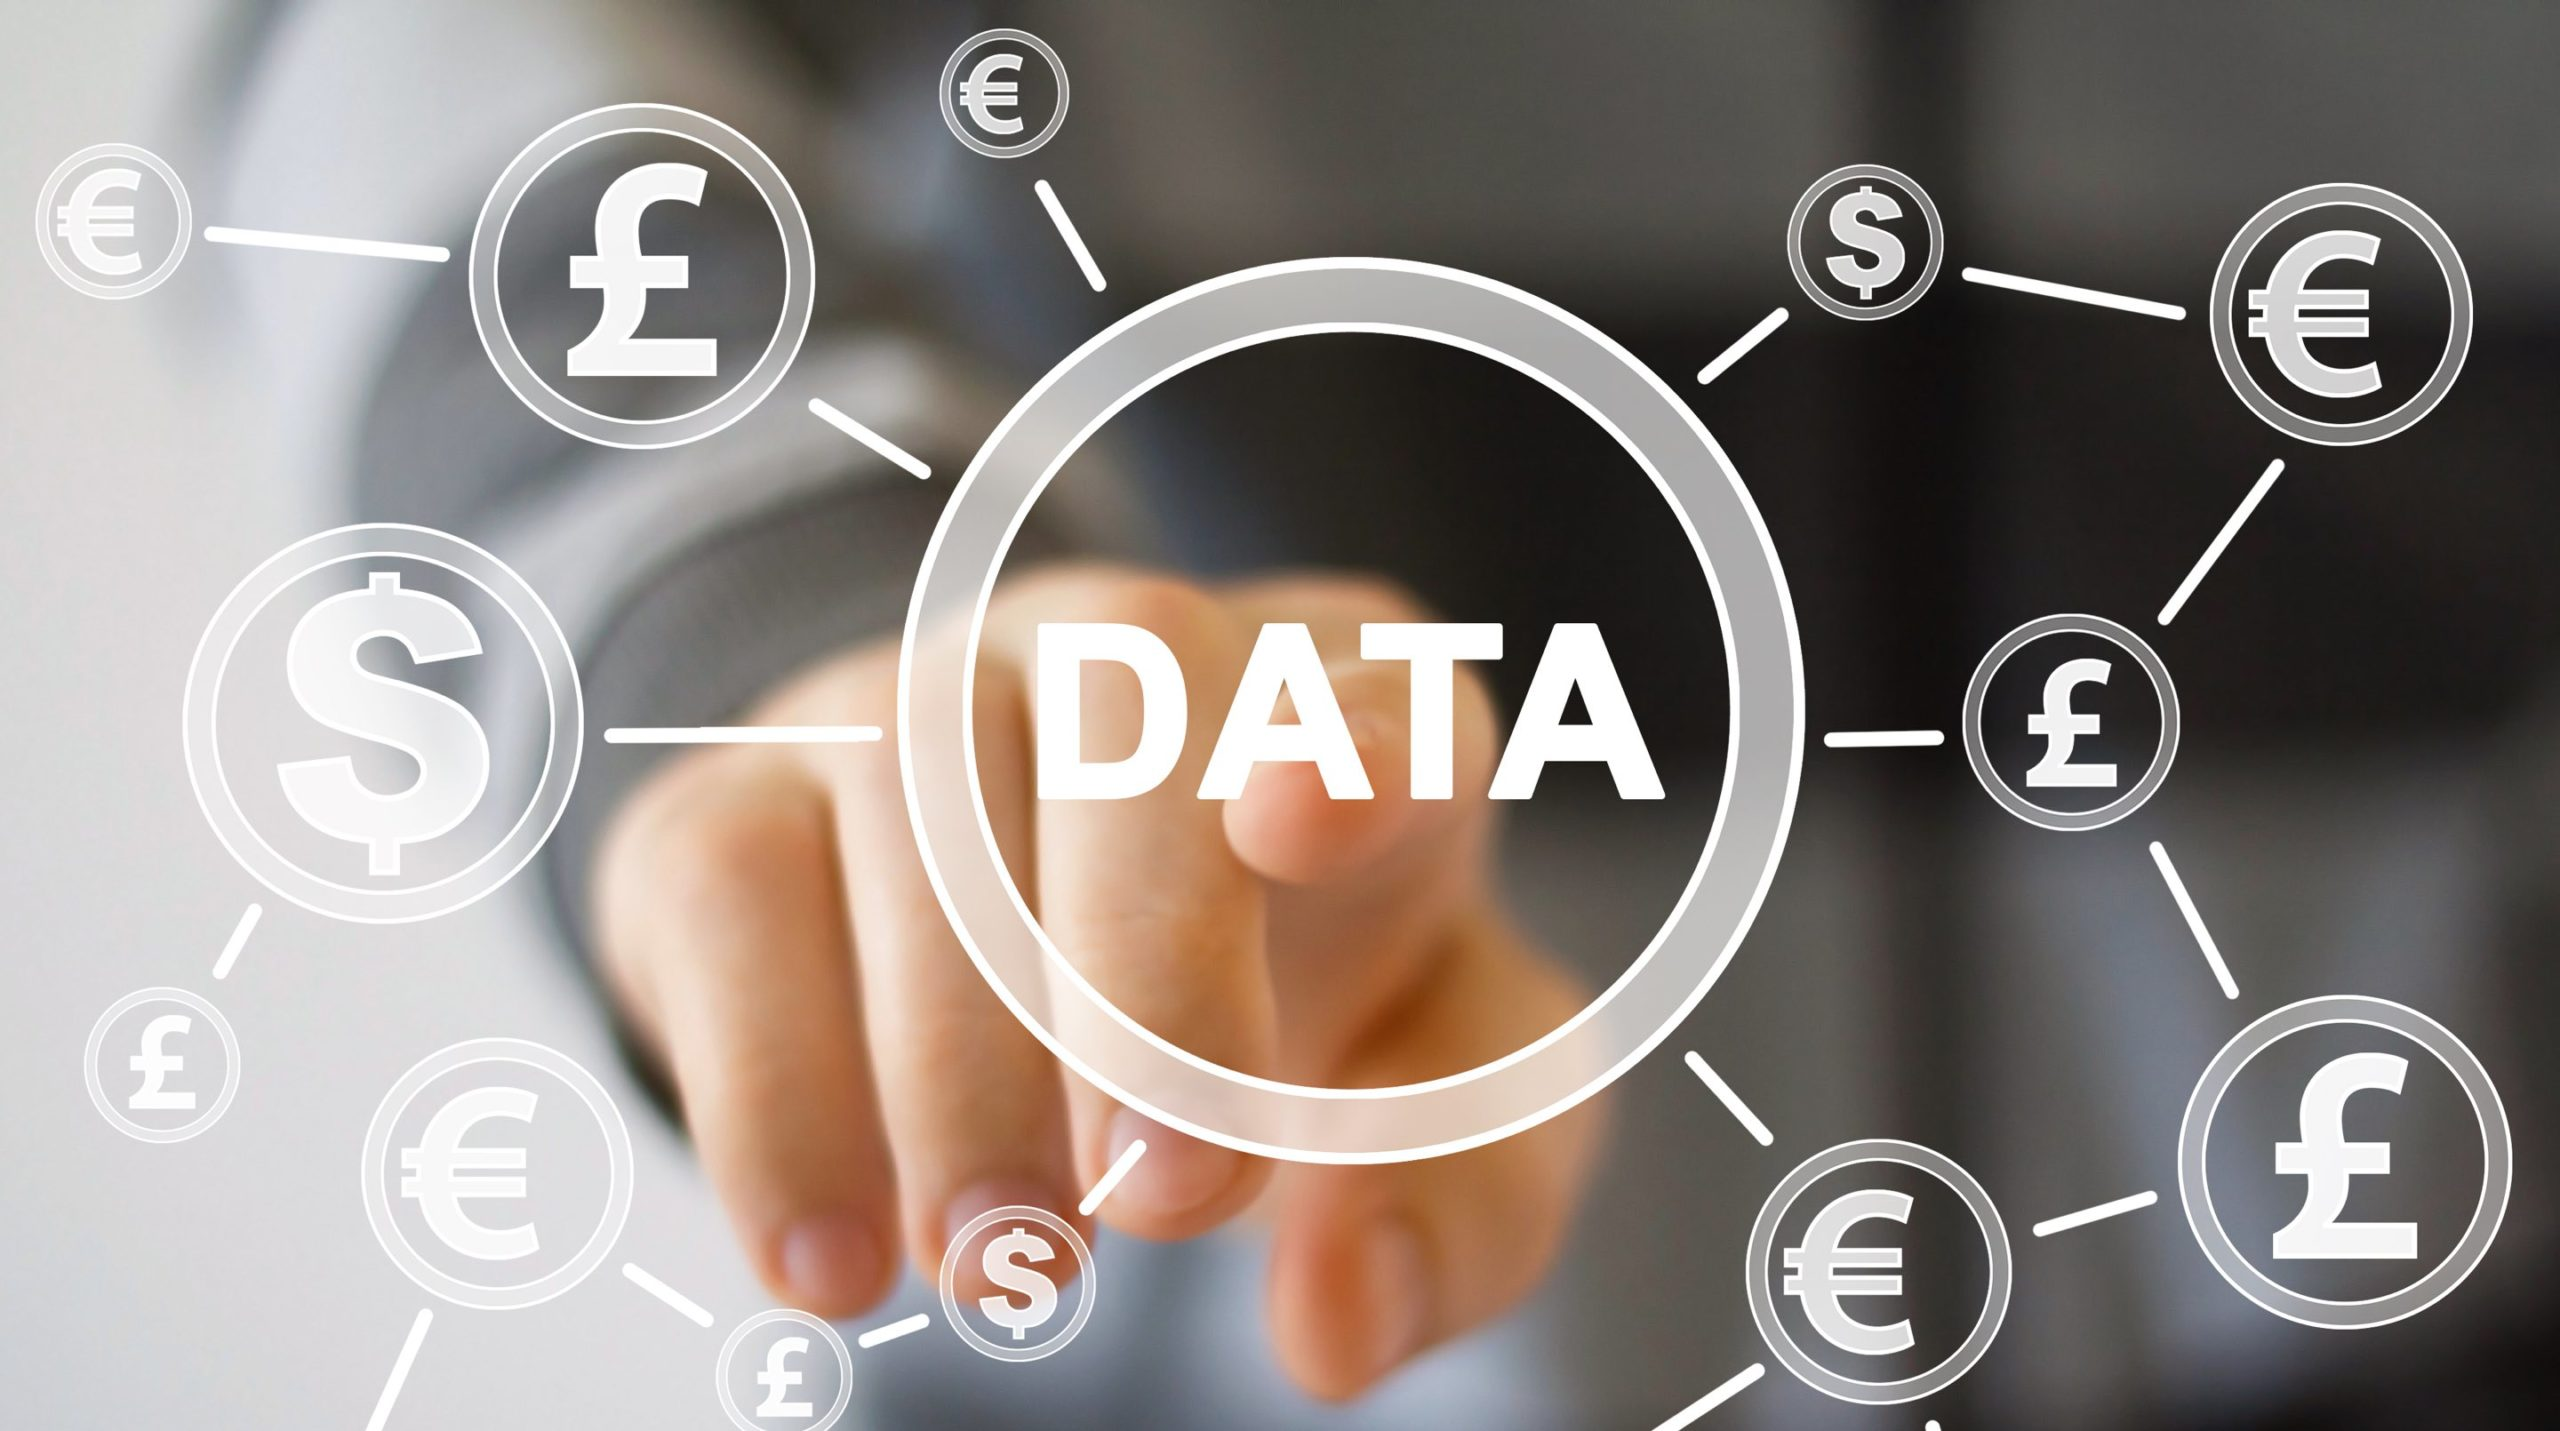 blog-banner-Digital Transformation fueled by data monetization: Internal and External